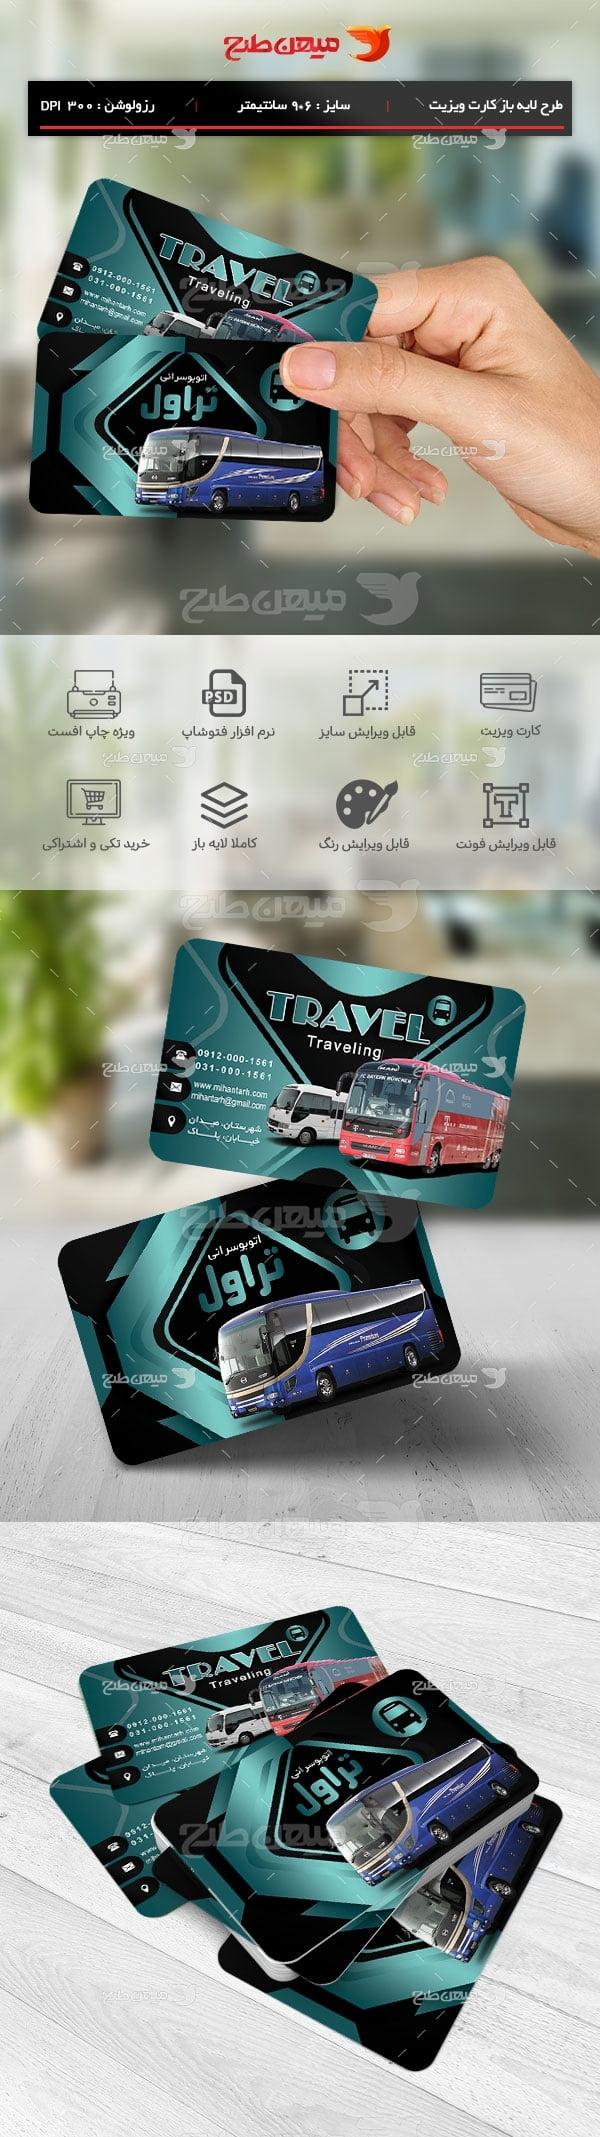 طرح لایه باز کارت ویزیت اتوبوسرانی